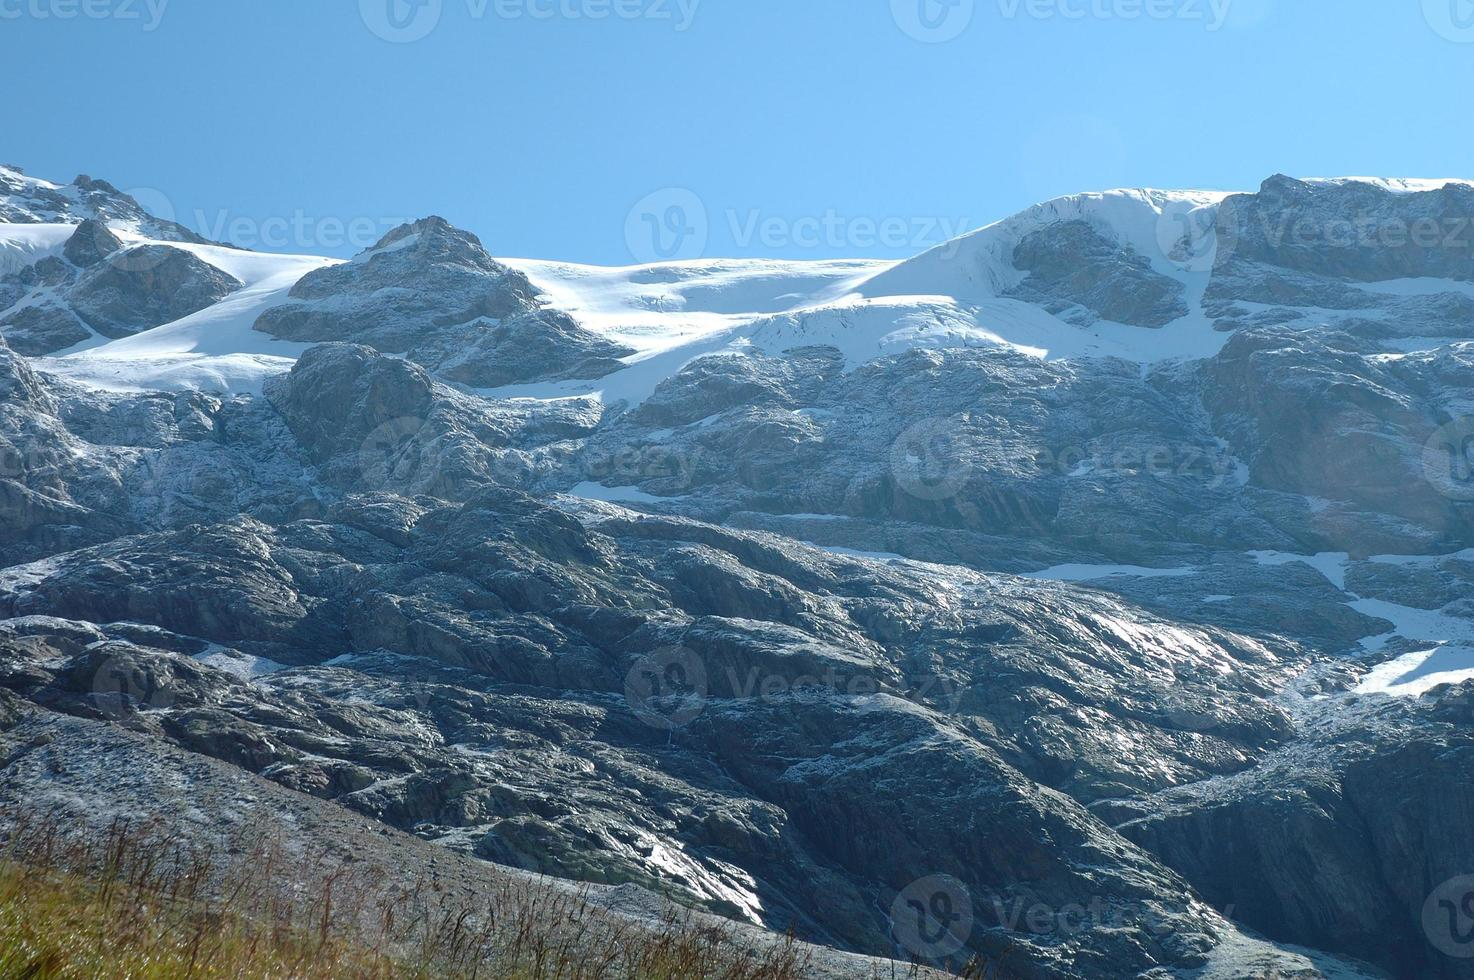 picos de neve próximos a Grindelwald, na Suíça foto